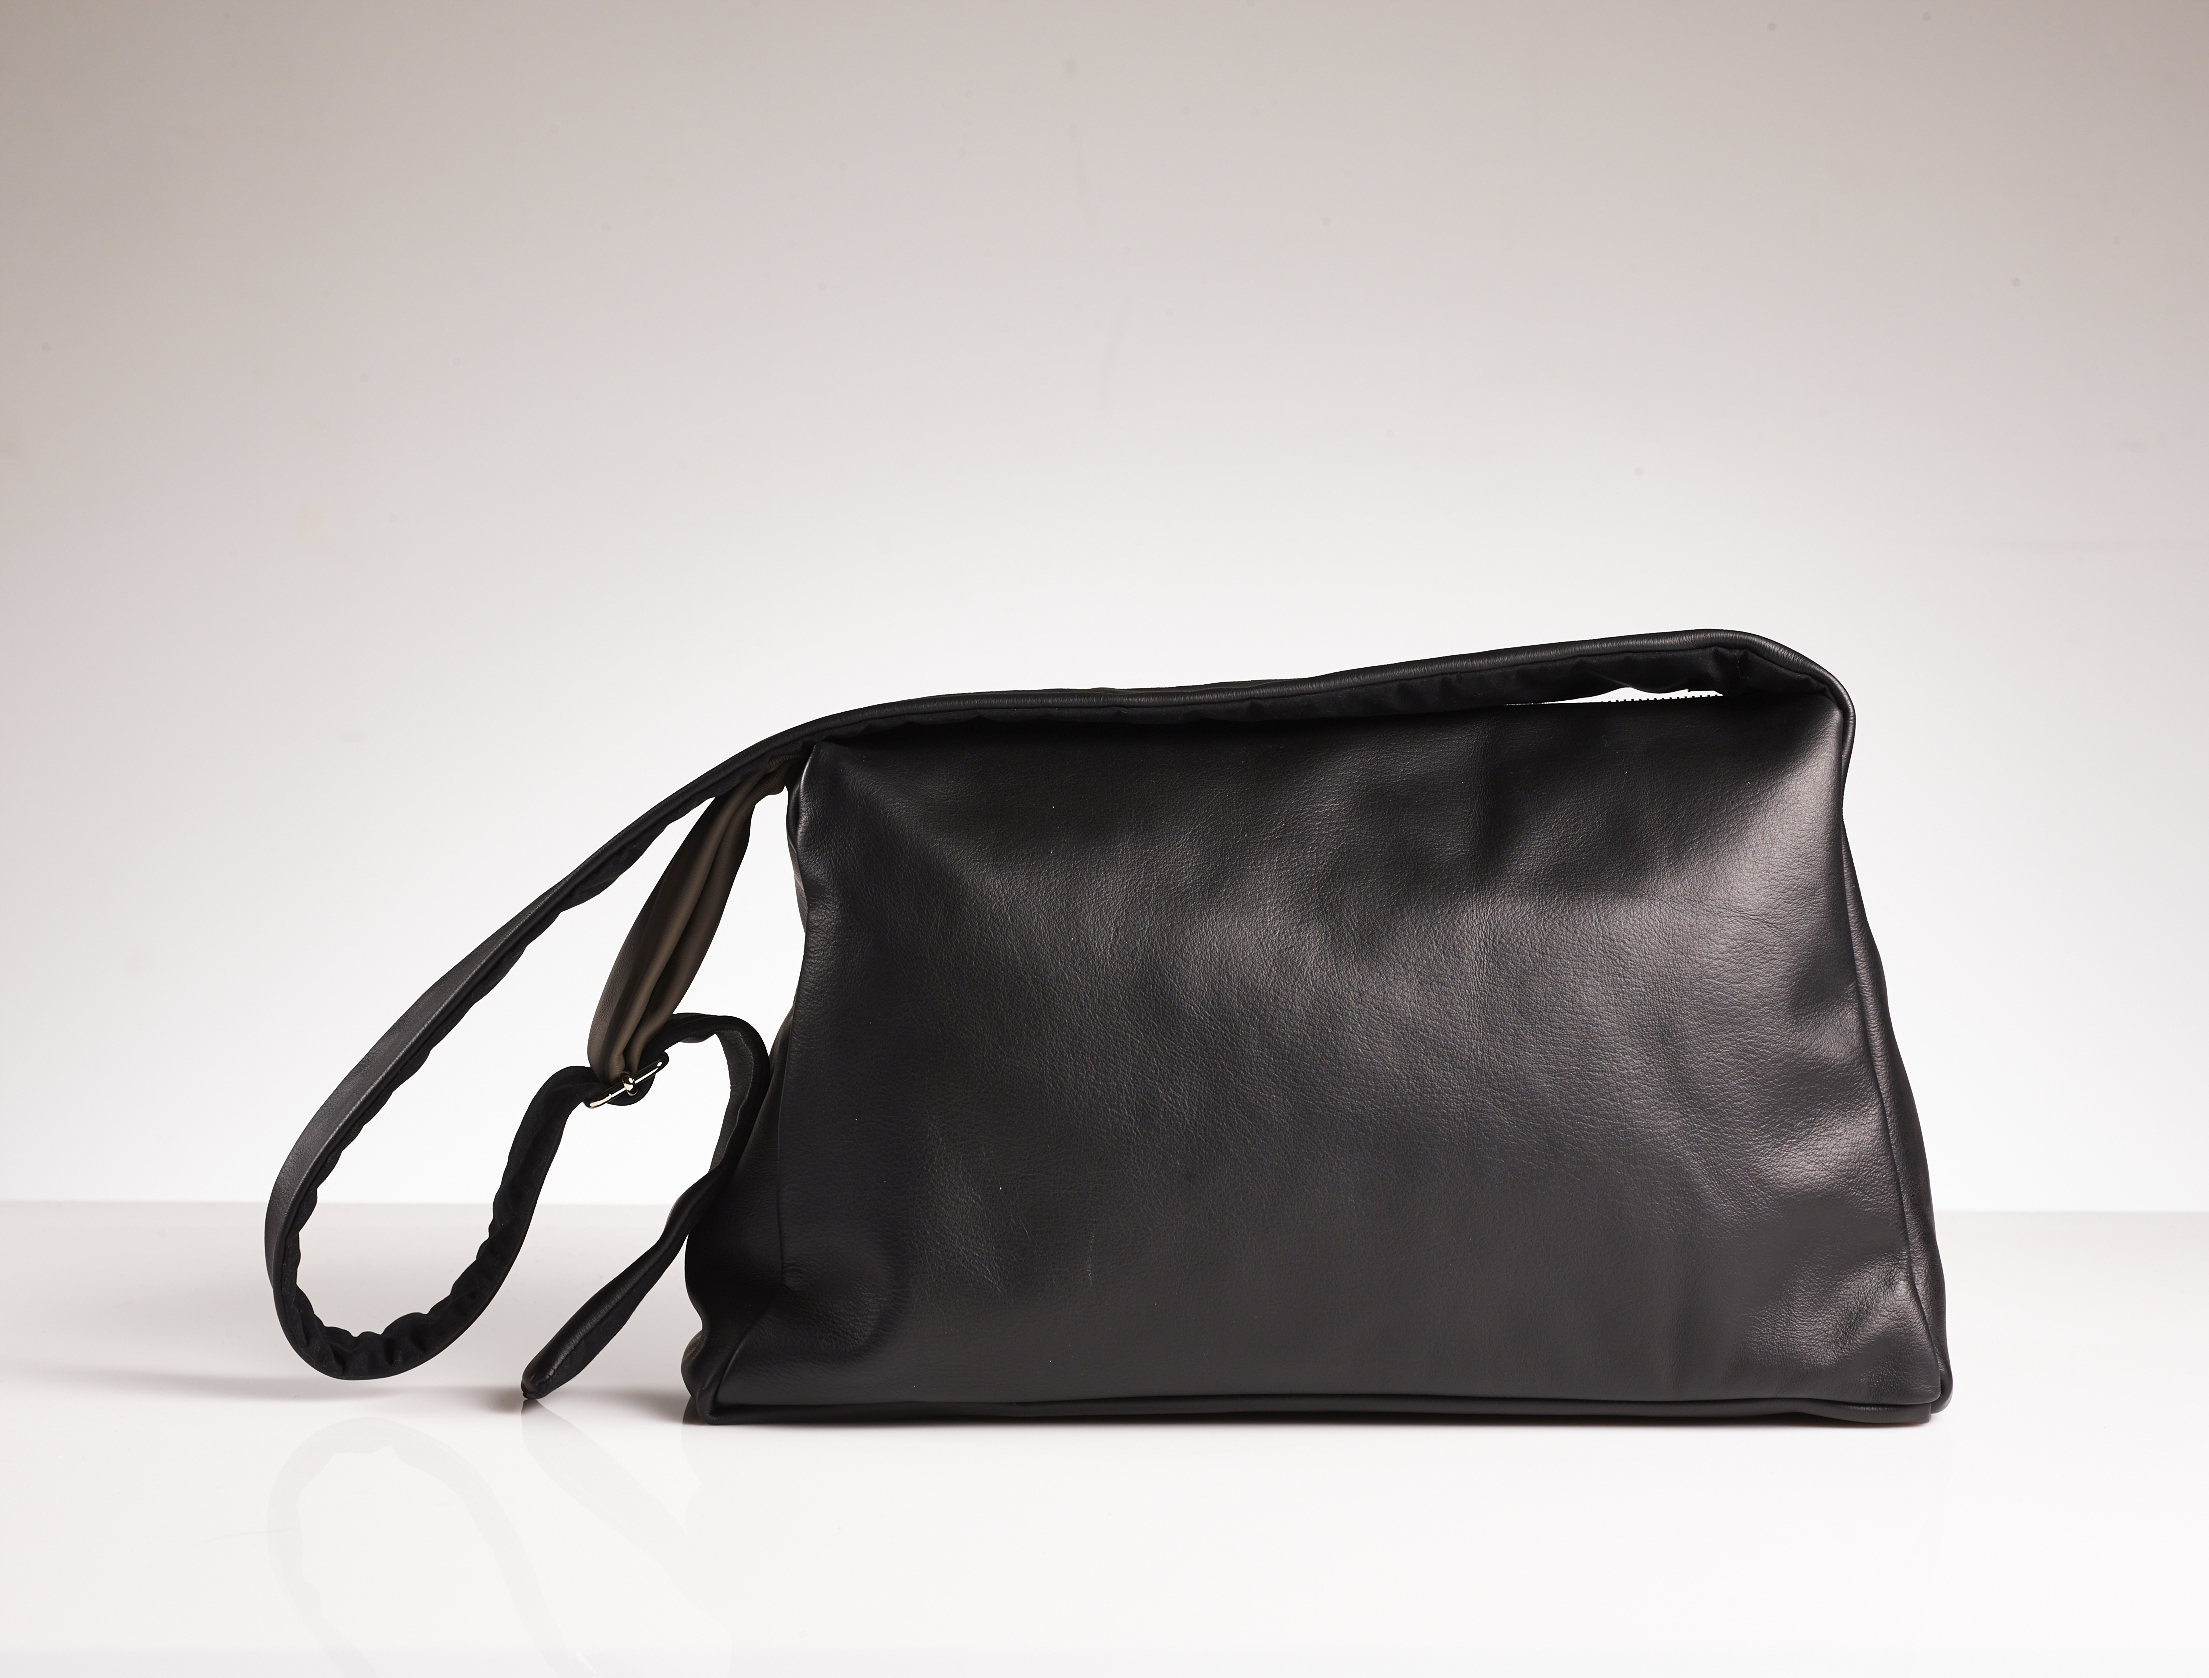 Strehlow handtasche_25992.jpg